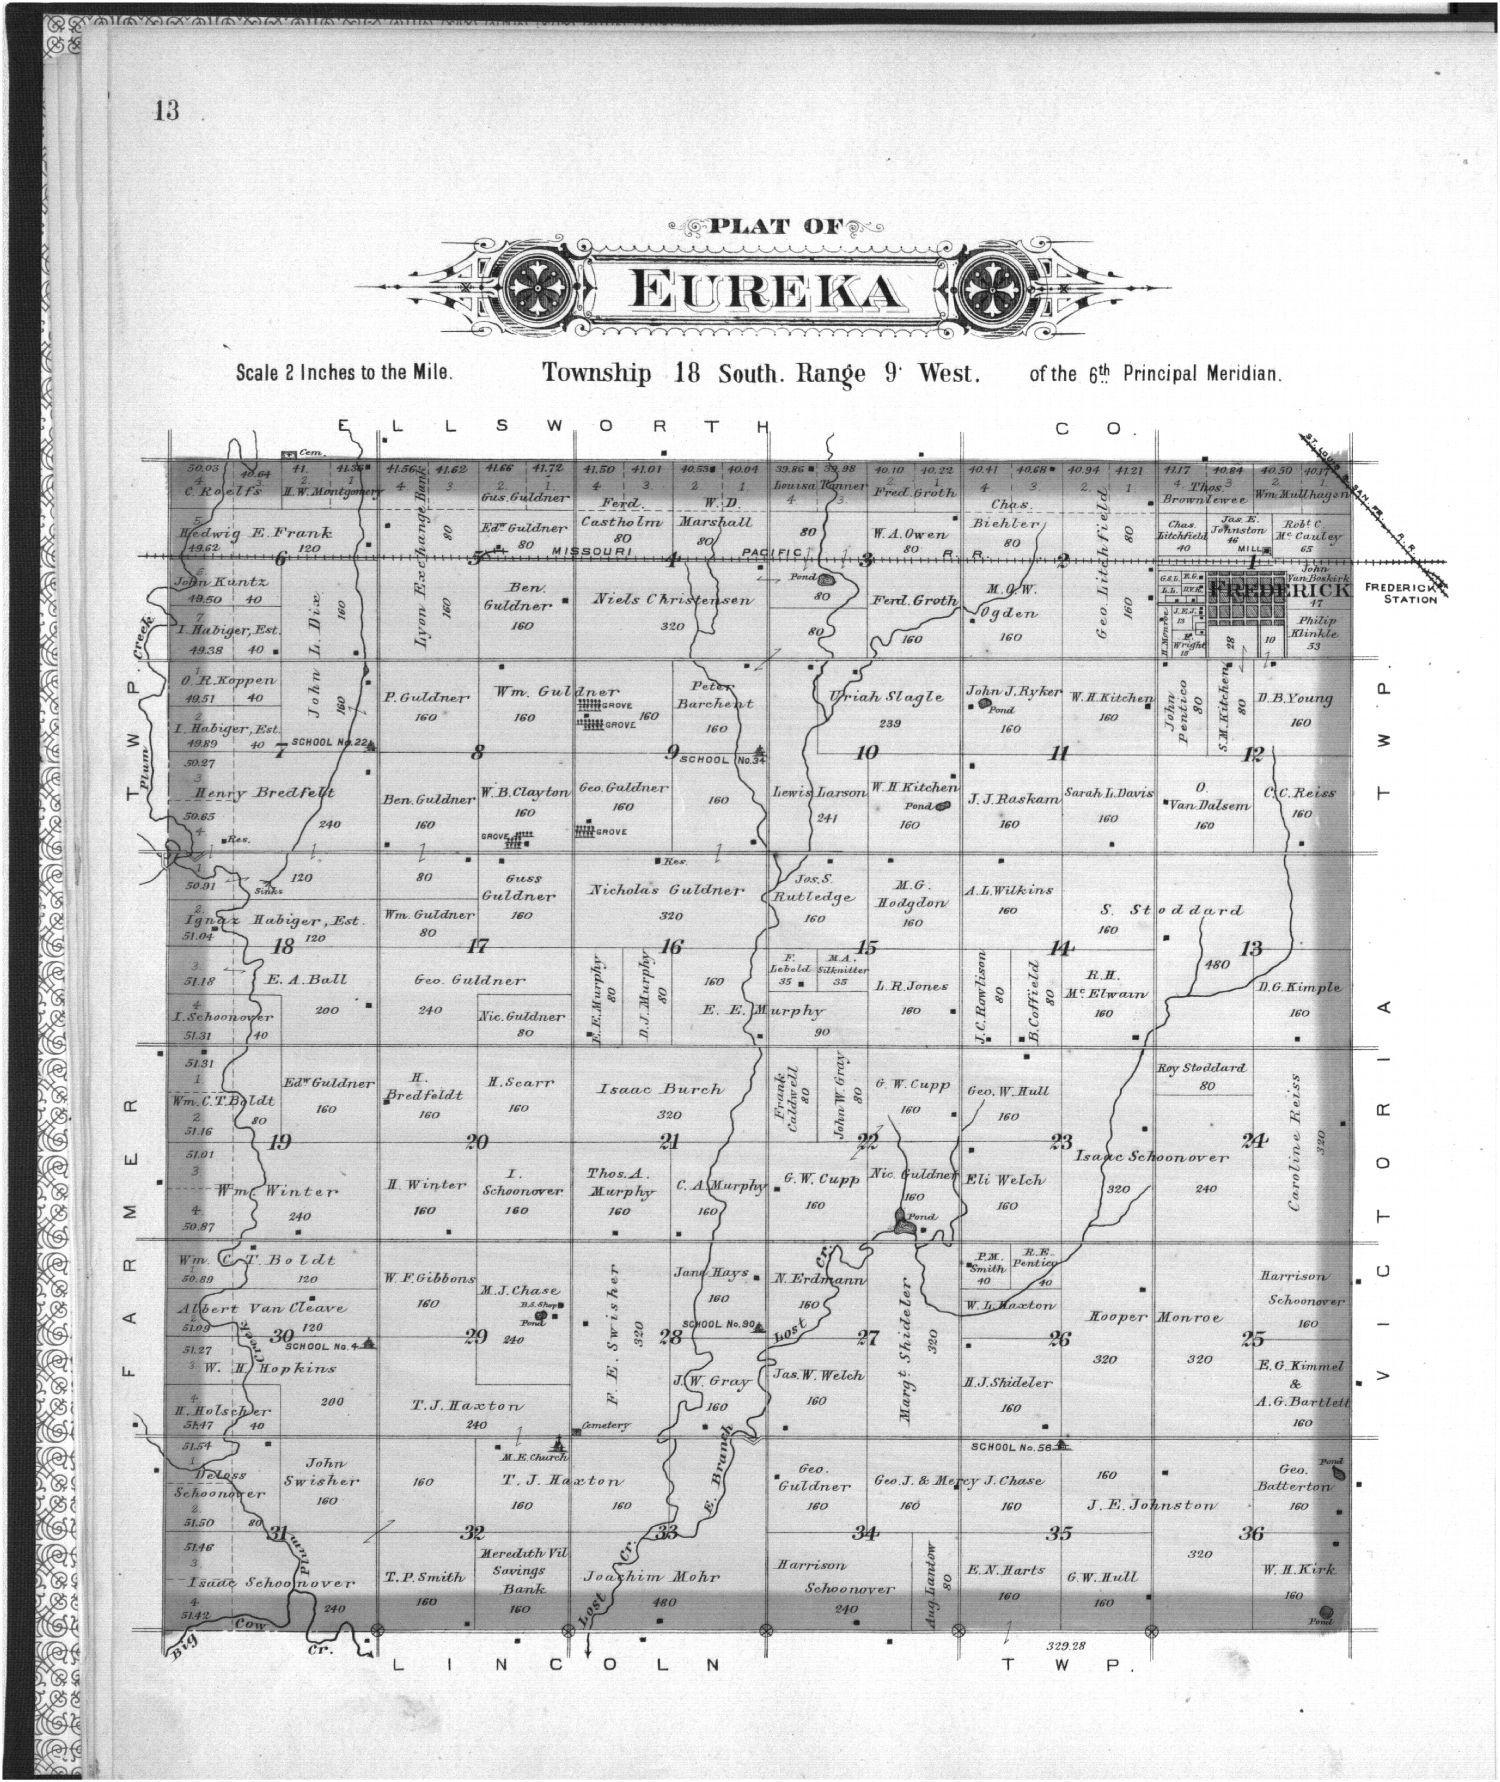 Plat book of Rice County, Kansas - 13